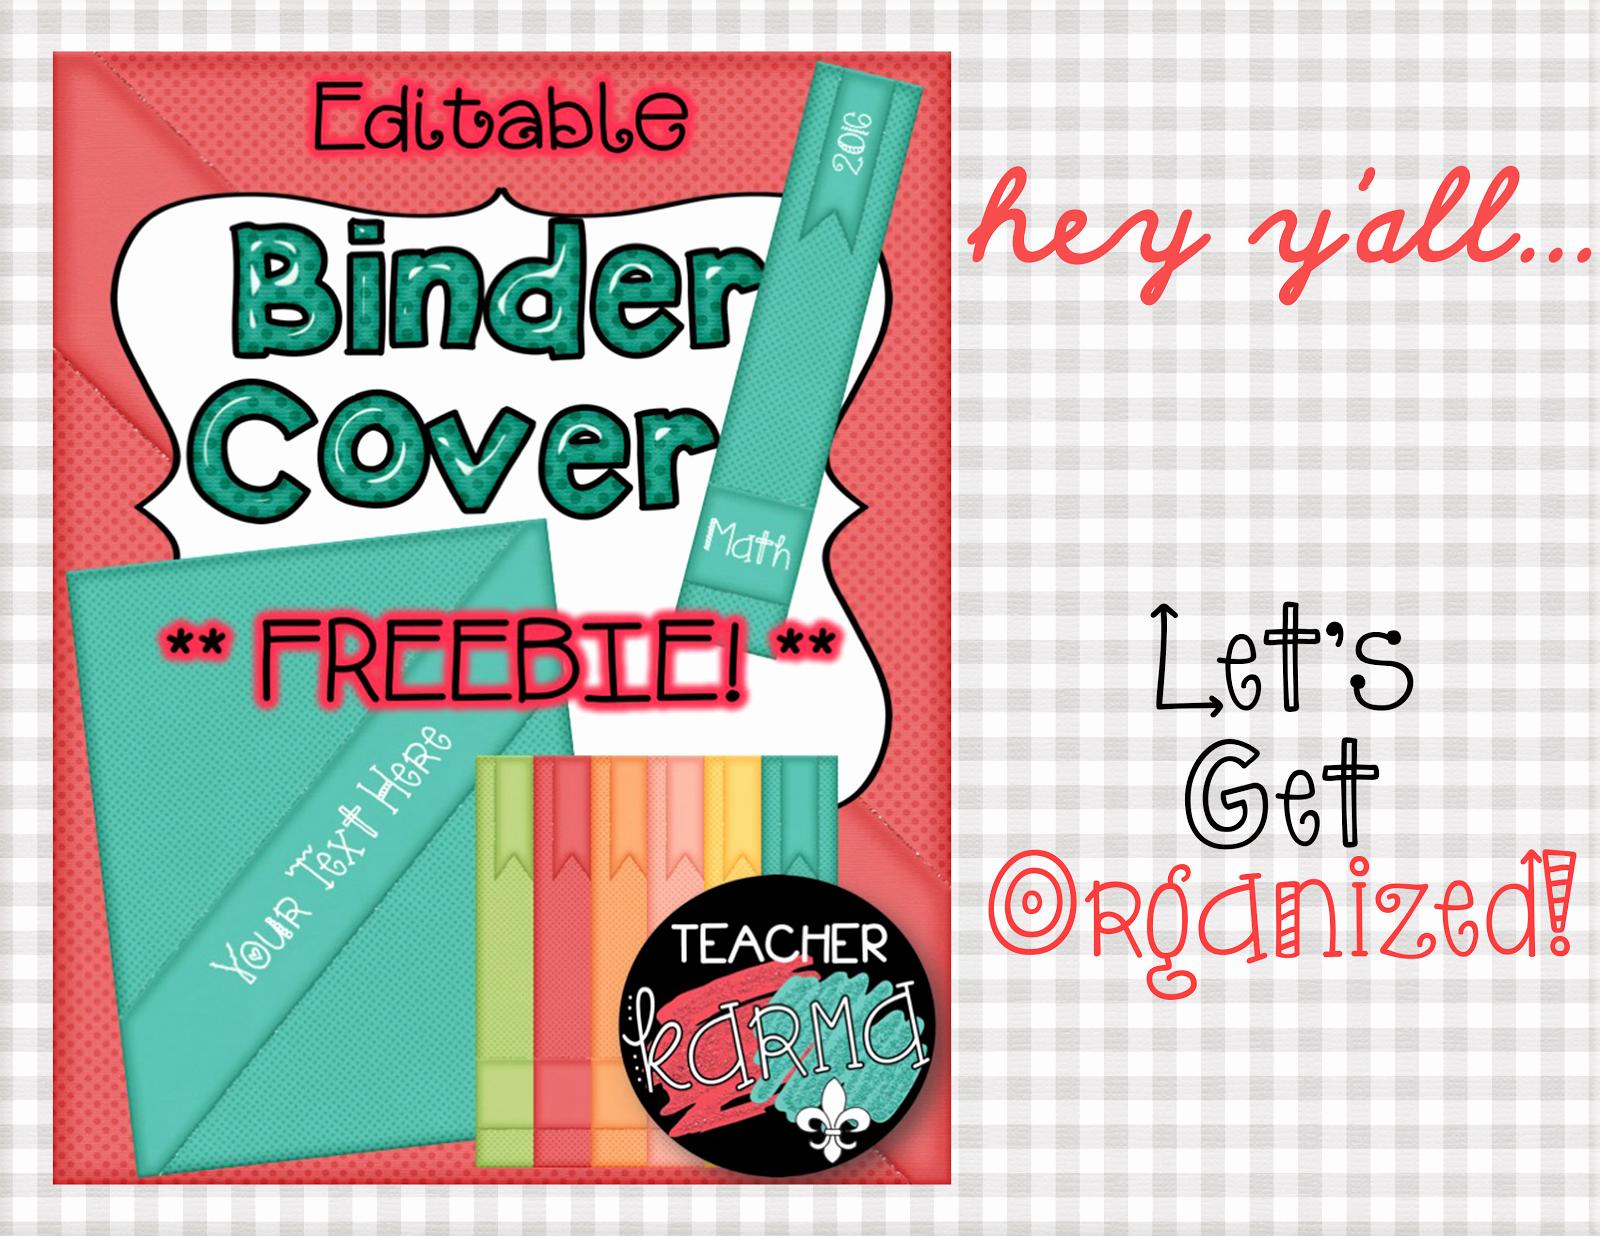 Free Editable Printable Binder Covers Awesome Binder Cover Freebie Teacher Karma